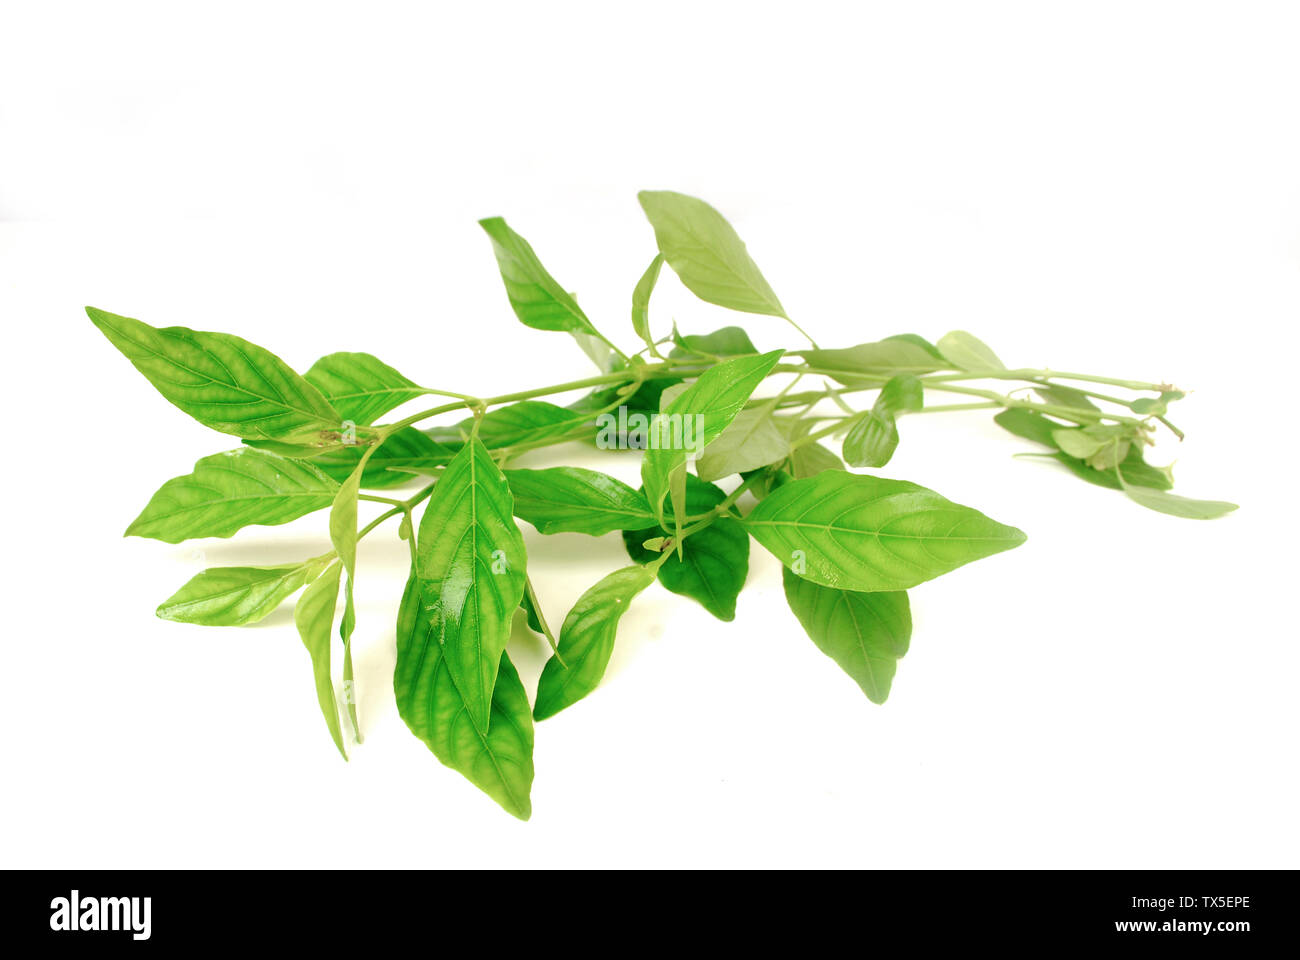 Nasutus Herbal extract. Rhinacanthus nasutus Kurz.Rhinacanthus. - Stock Image